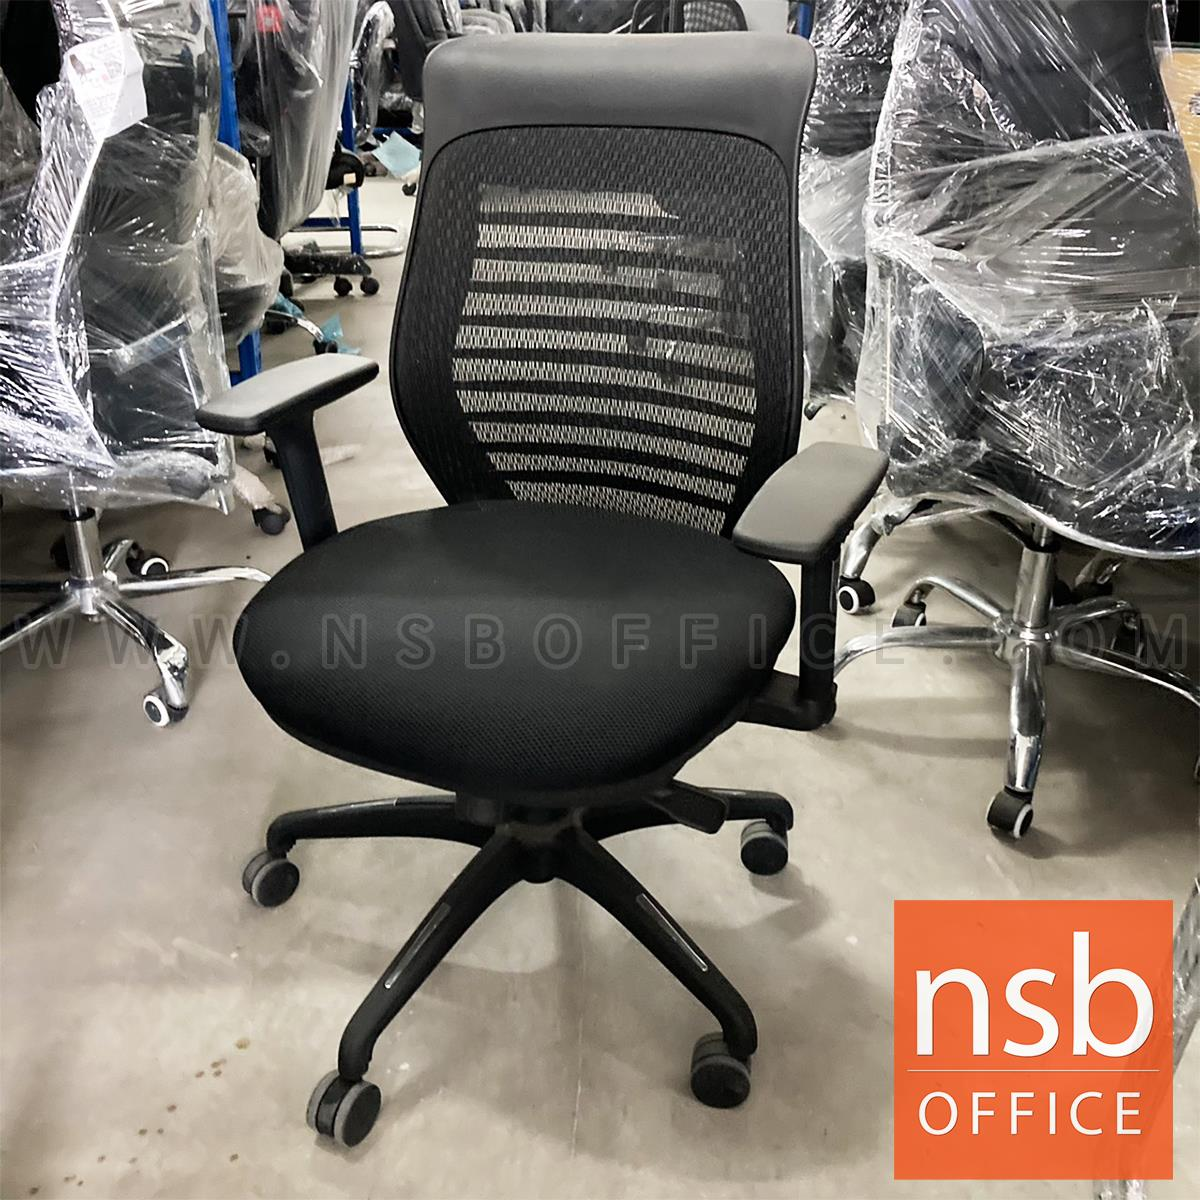 L02A349:เก้าอี้สำนักงานหลังเน็ต    โช๊คแก๊ส มีก้อนโยก ขาพลาสติก